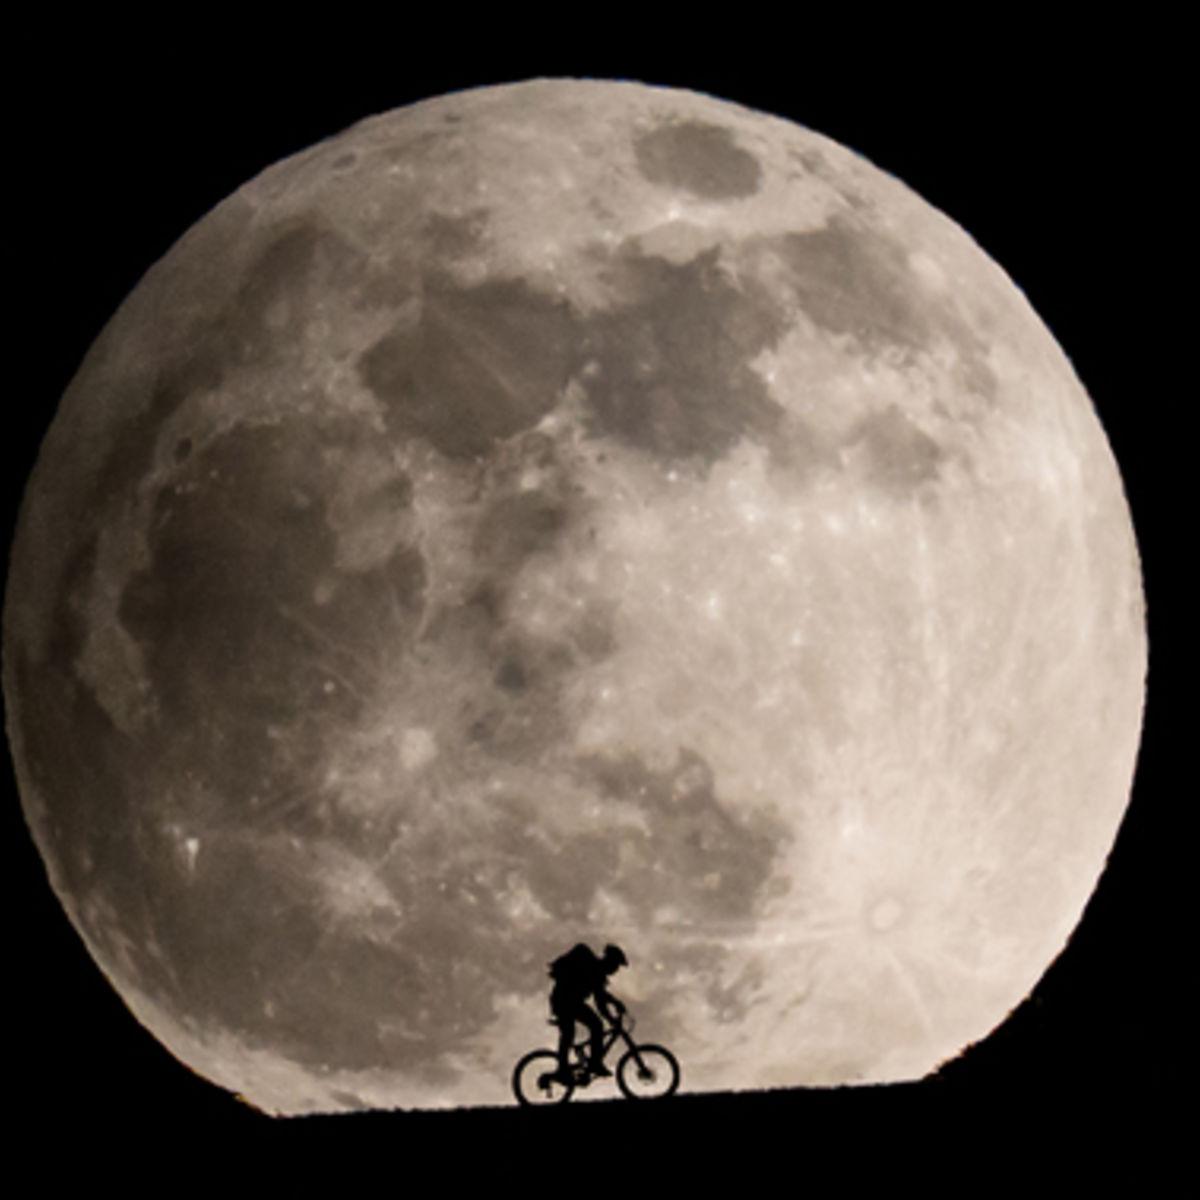 schmidli_moon1.jpg